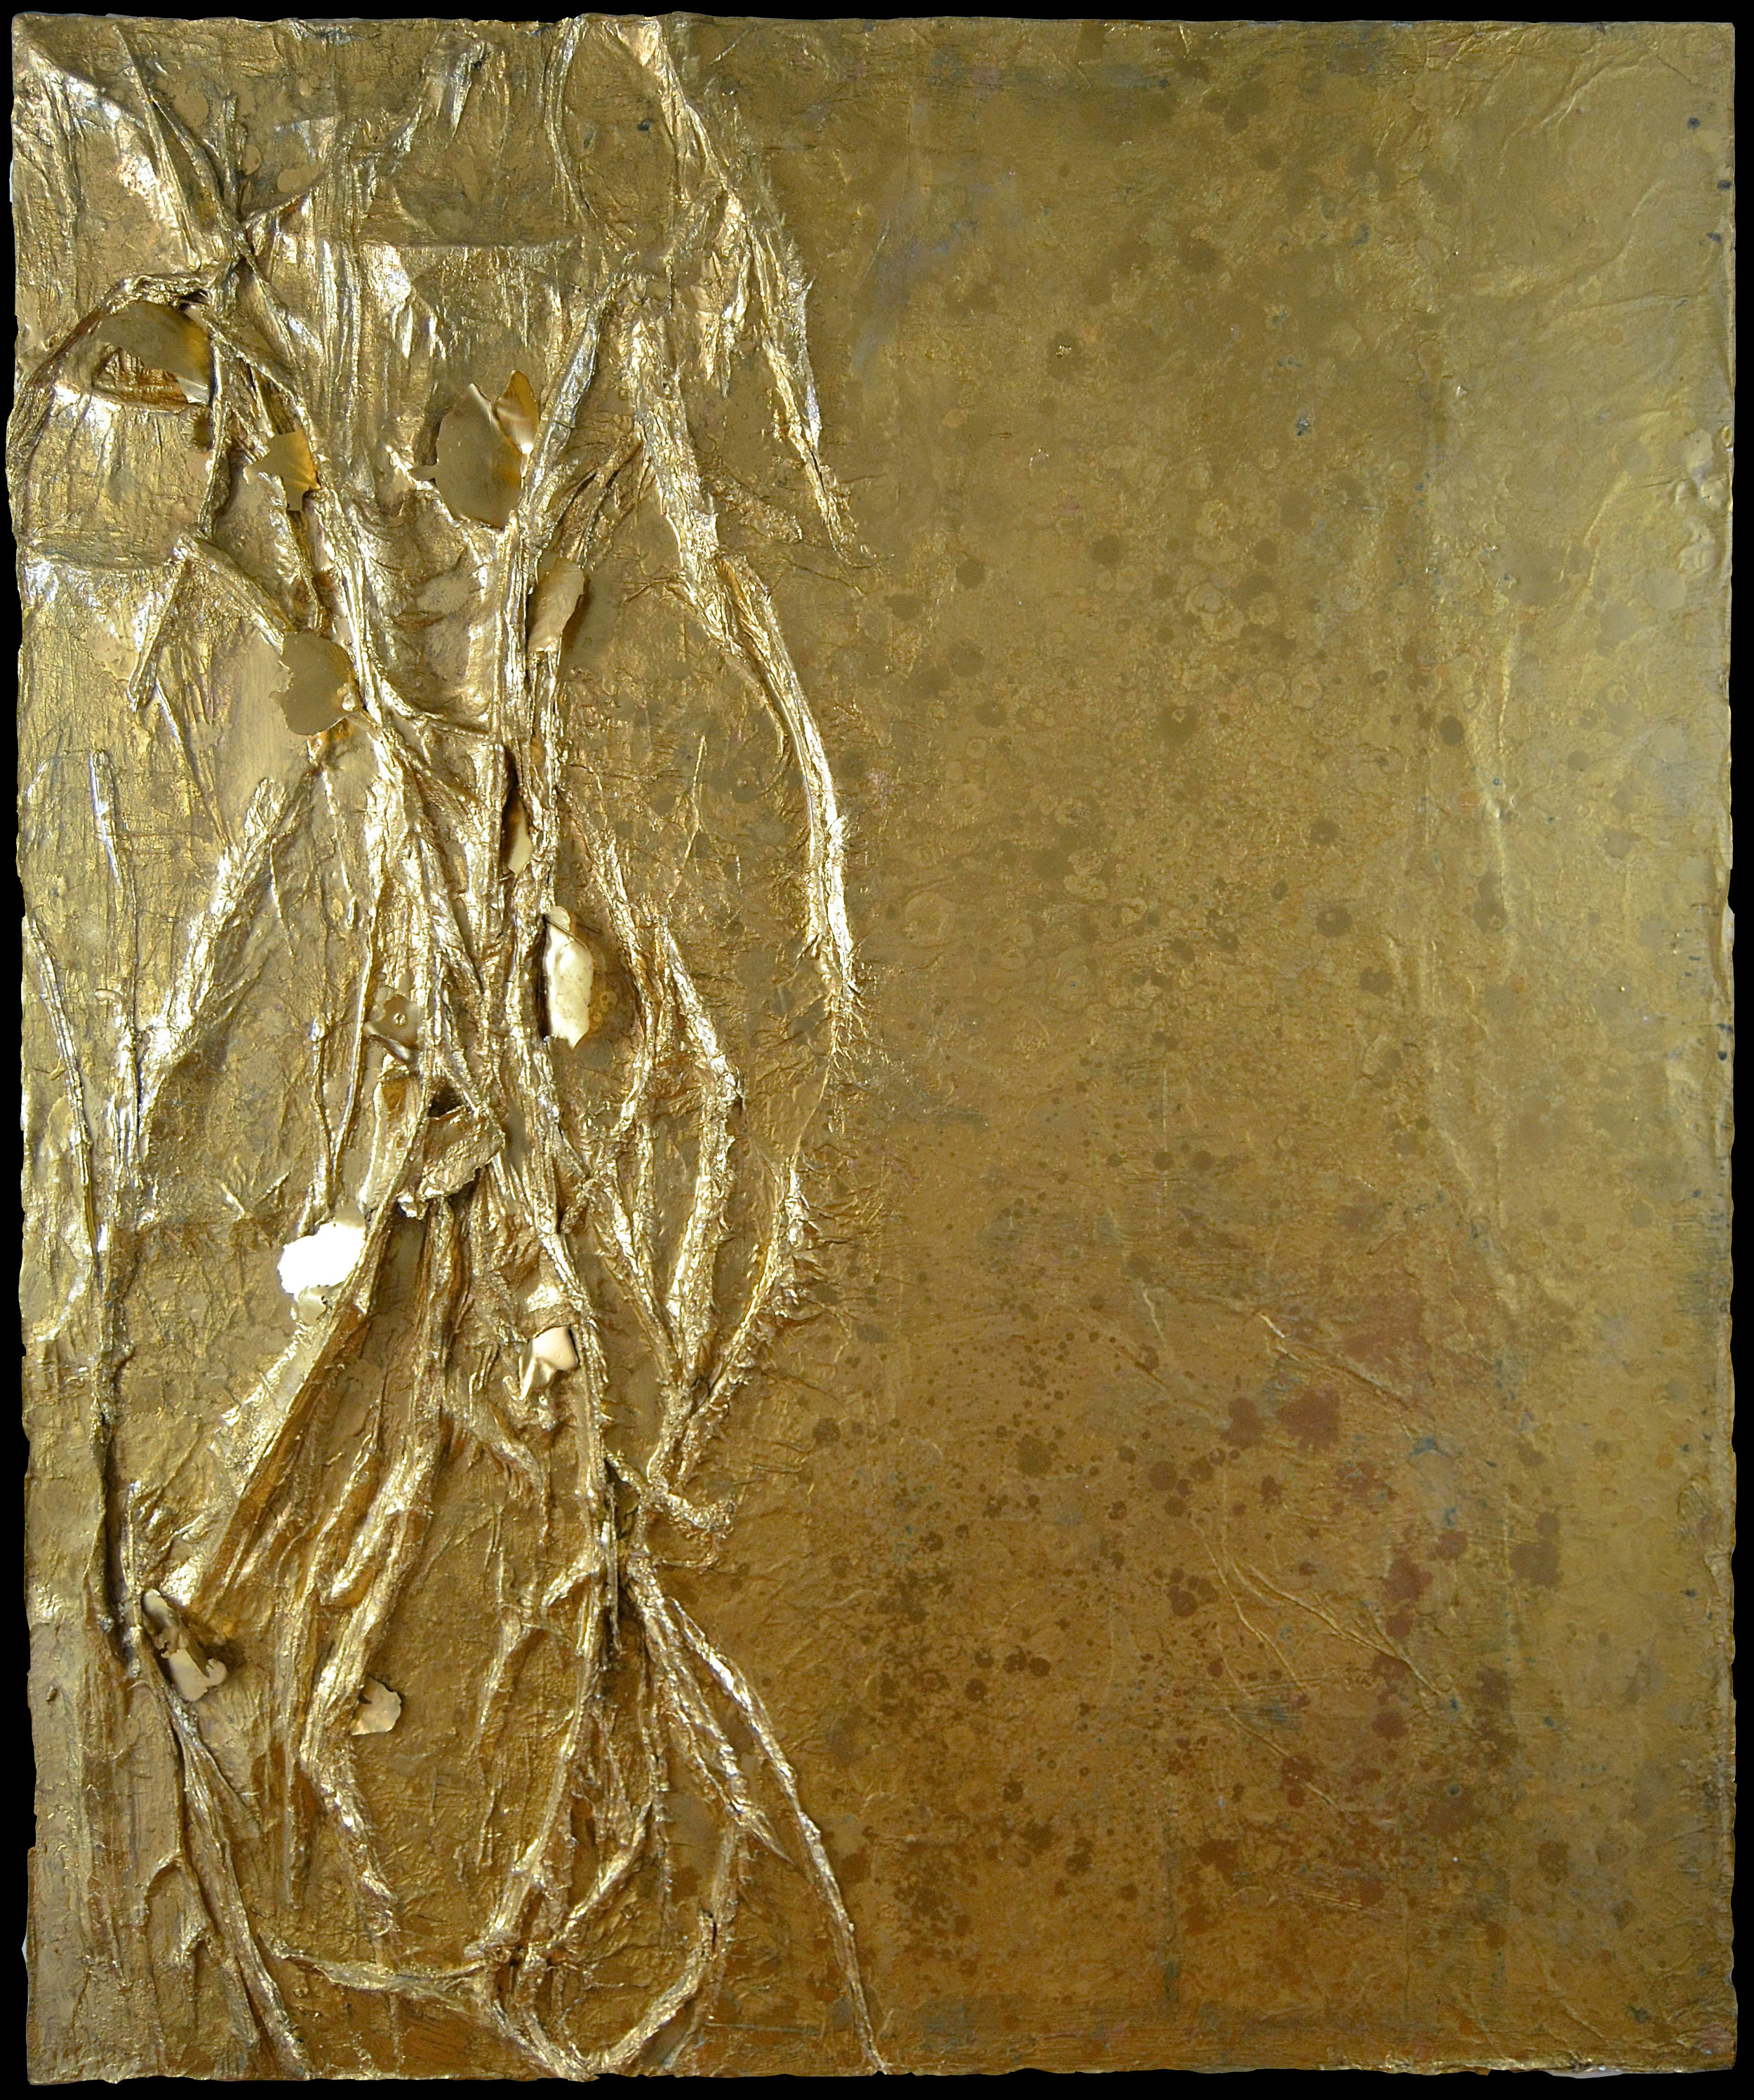 VEINS OF GOLD EMBEDDED - SARAH RASKEY FINE ART